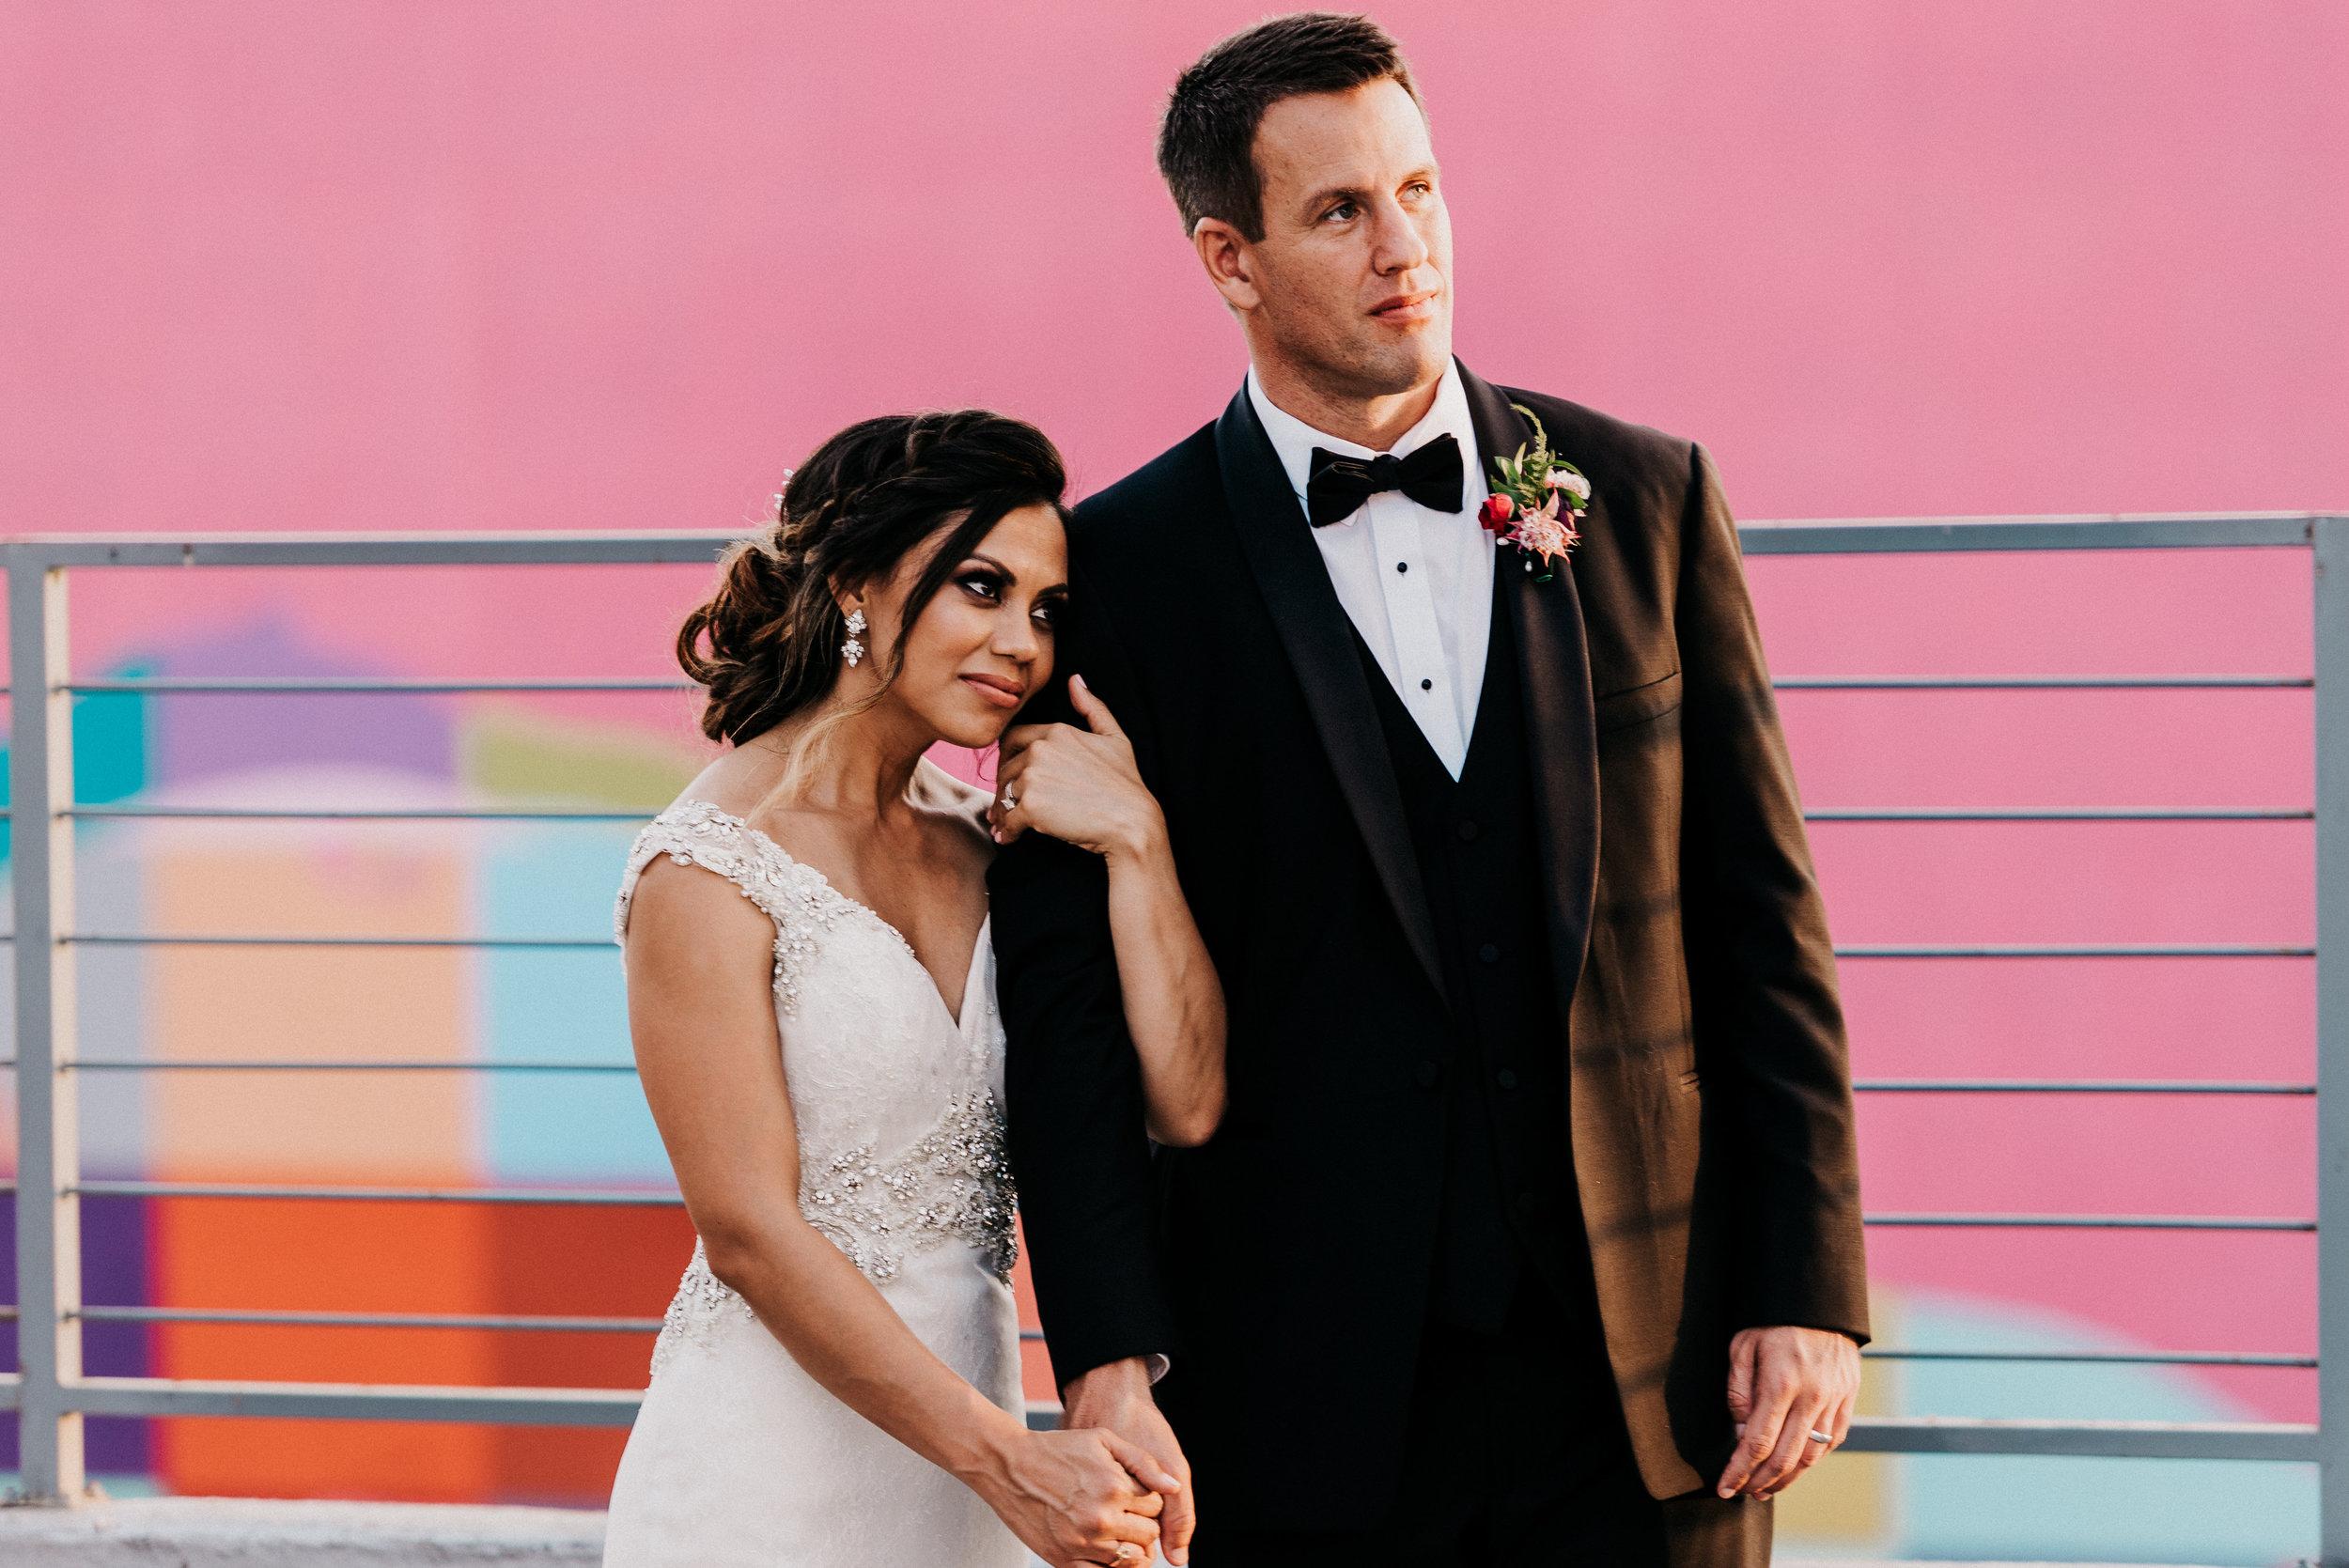 JACKIE JOSH WEDDING 2018-PREVIEW-0008.jpg